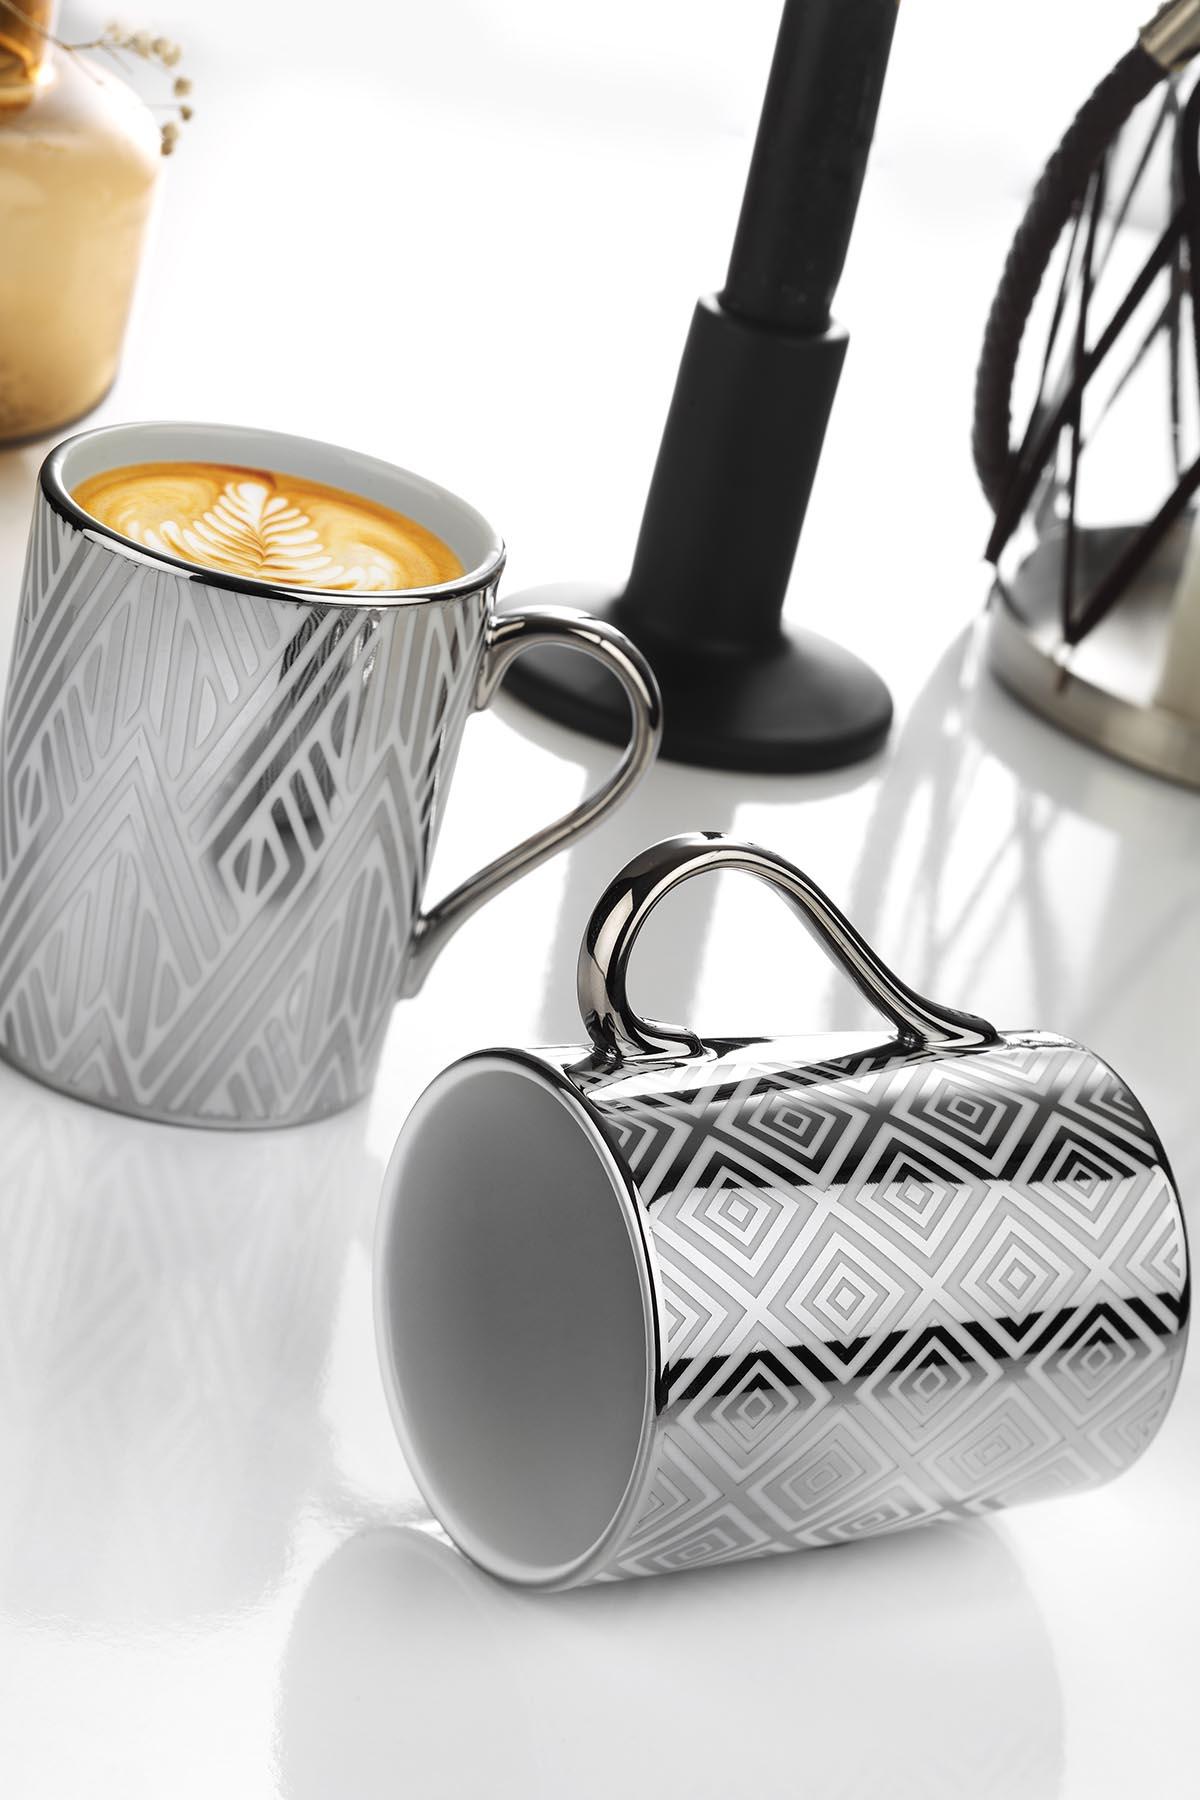 Kütahya Porselen Forest 2′li Mug Bardak Platin 10932